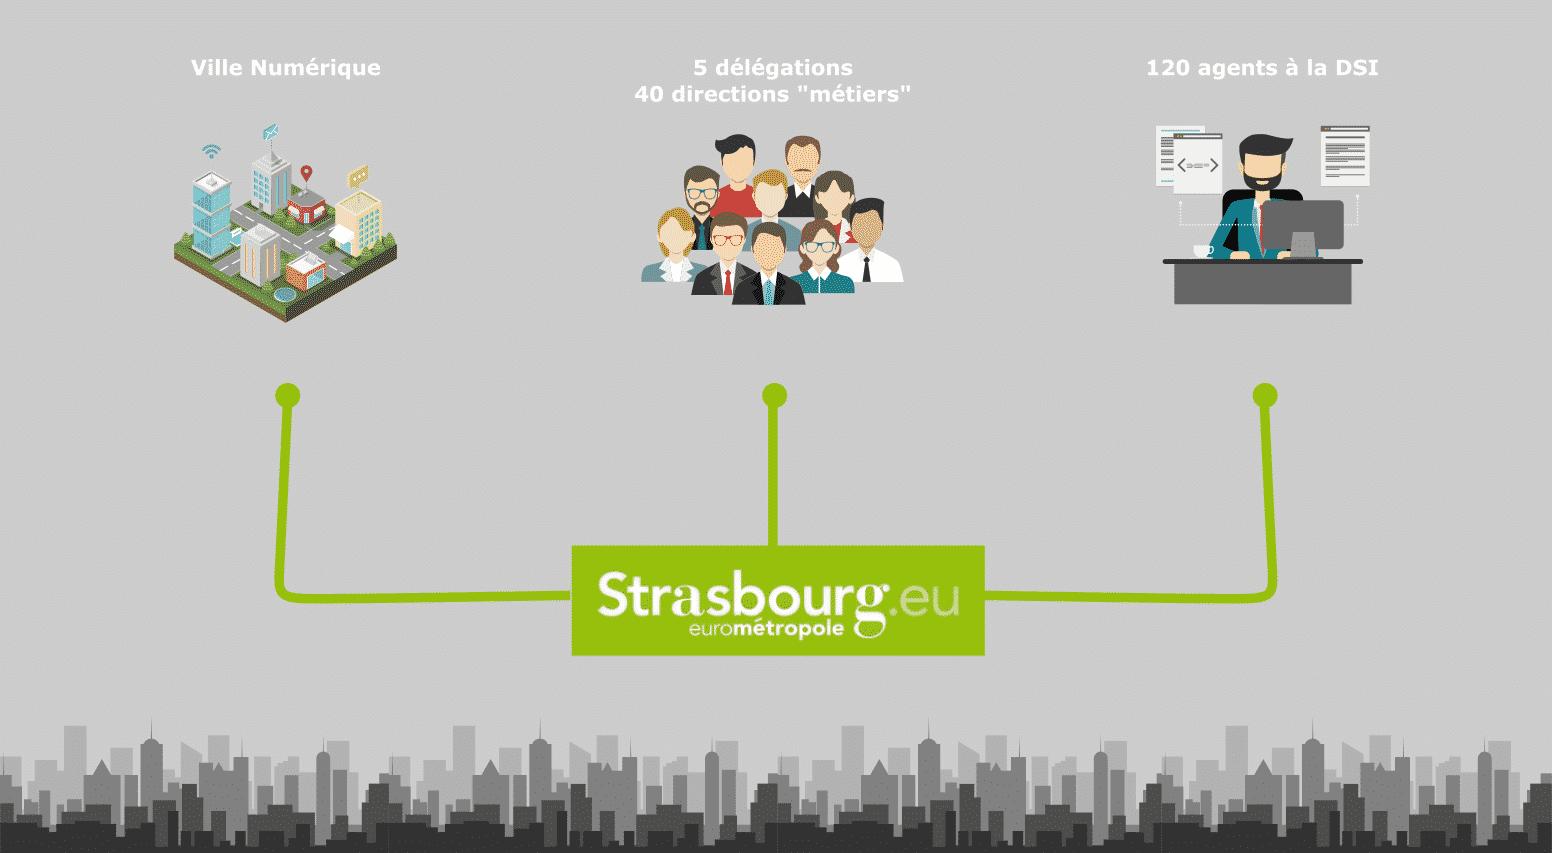 Eurométropole de Strasbroug - organigramme - infographie